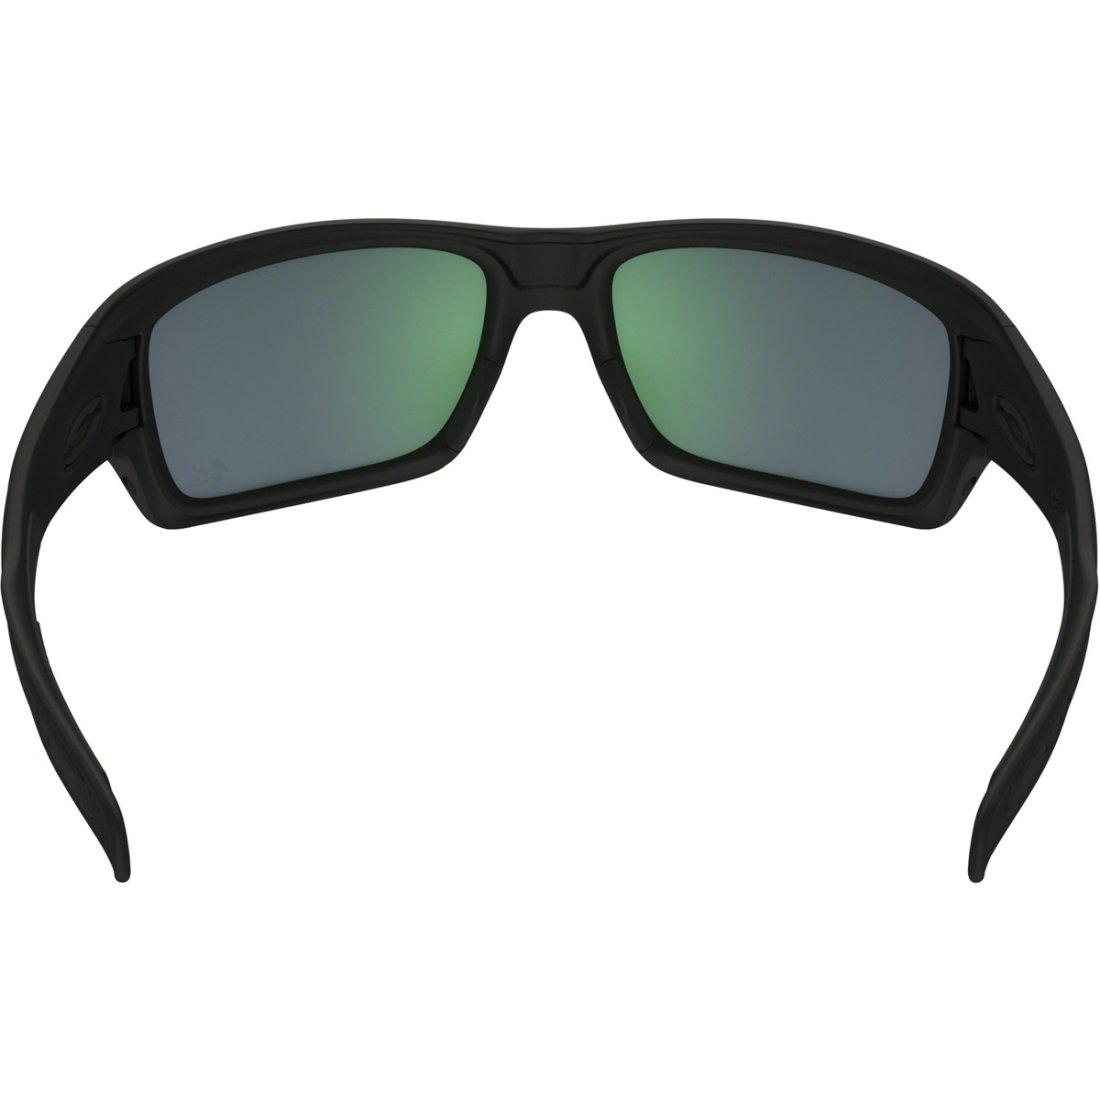 Gp Occhiali Jade Oakley Da Iridium Matte Moto Turbine Sole Black rqX7ZxCq